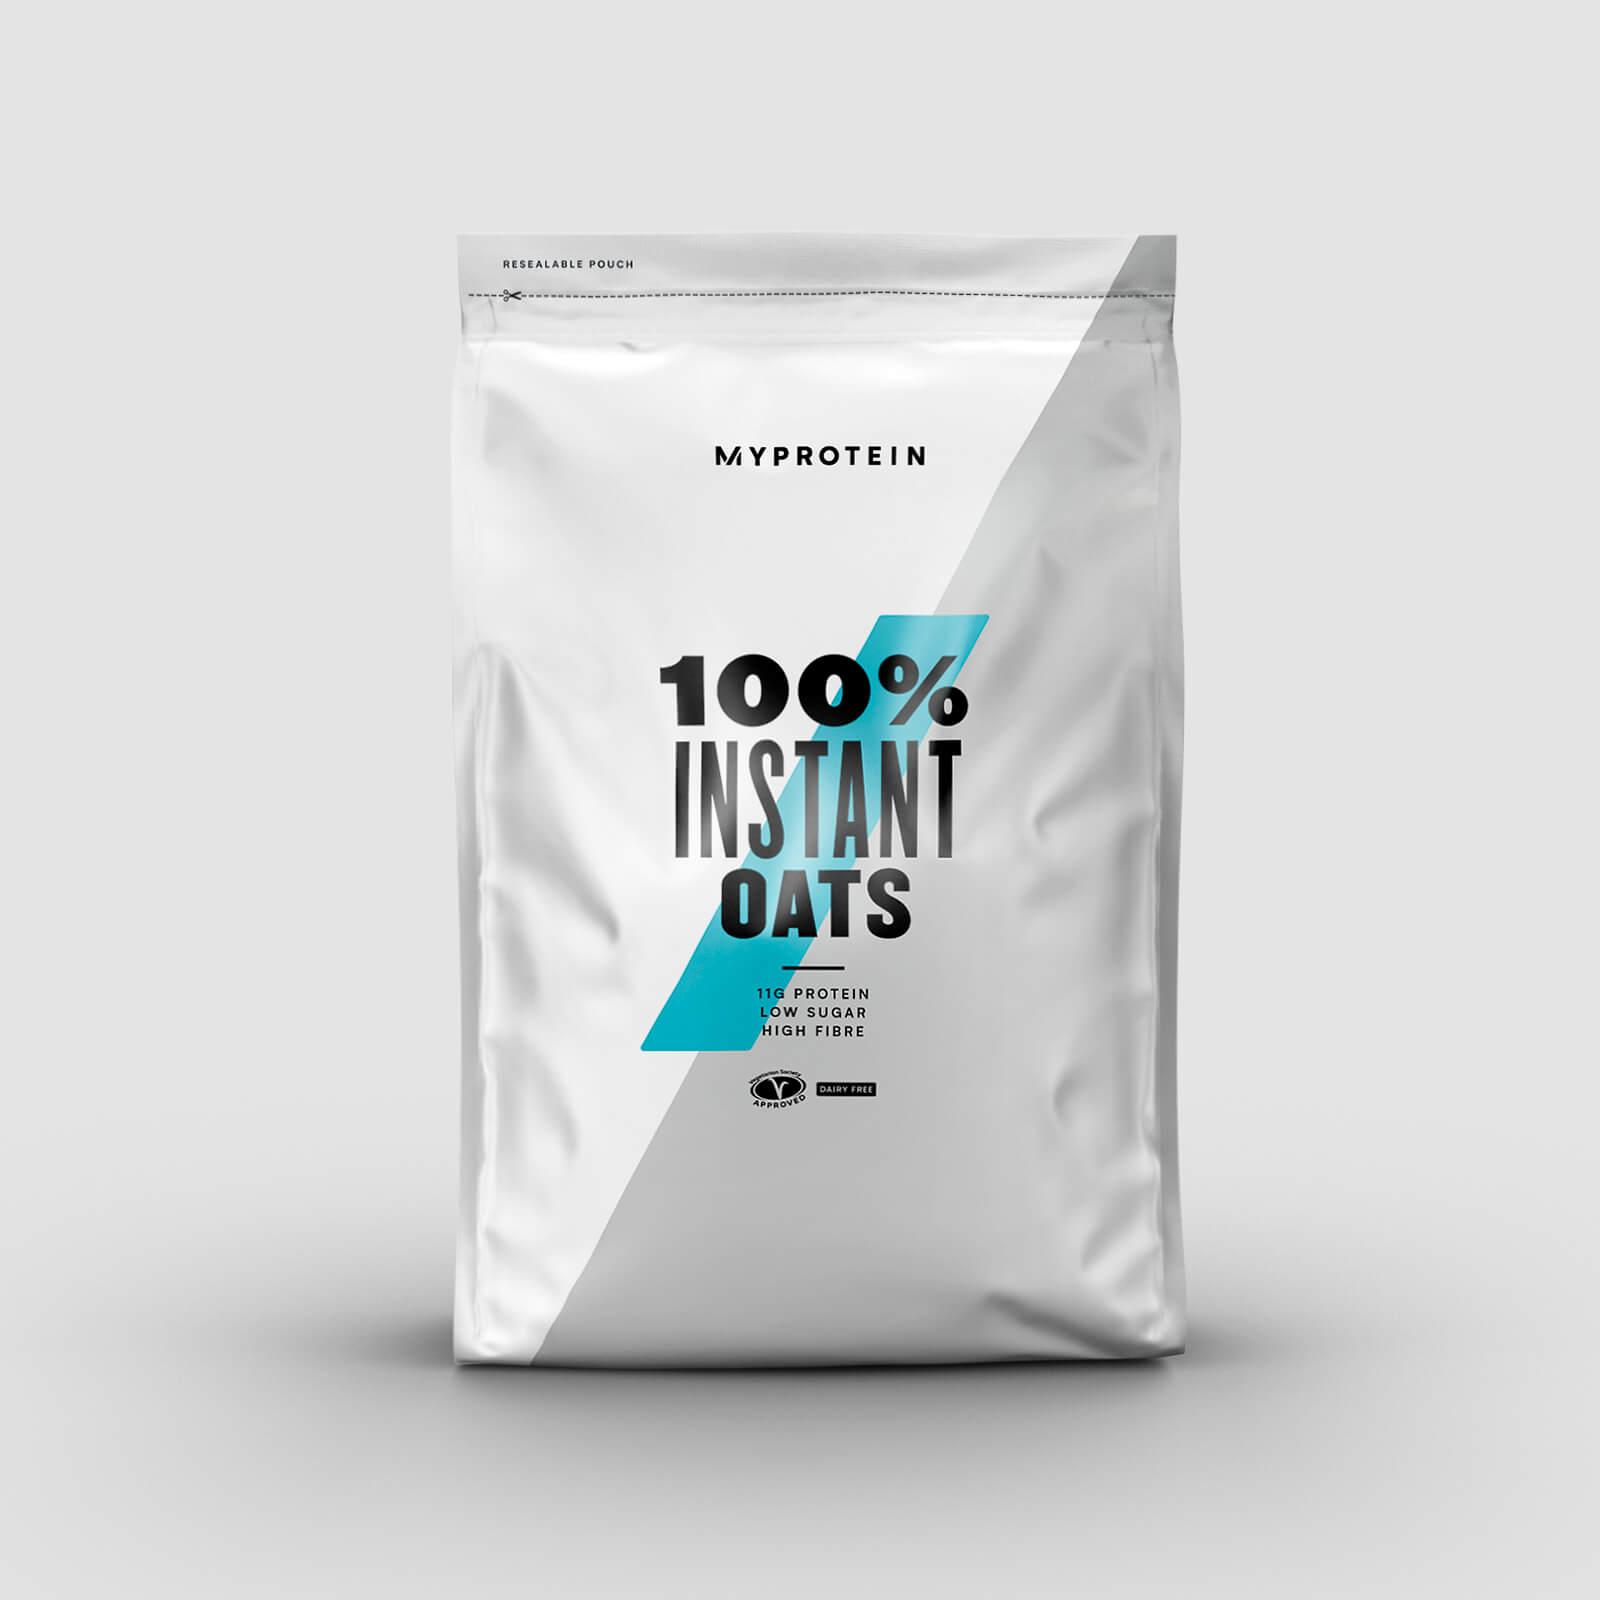 Myprotein Avoine instantanée en poudre - 2.5kg - Vanille